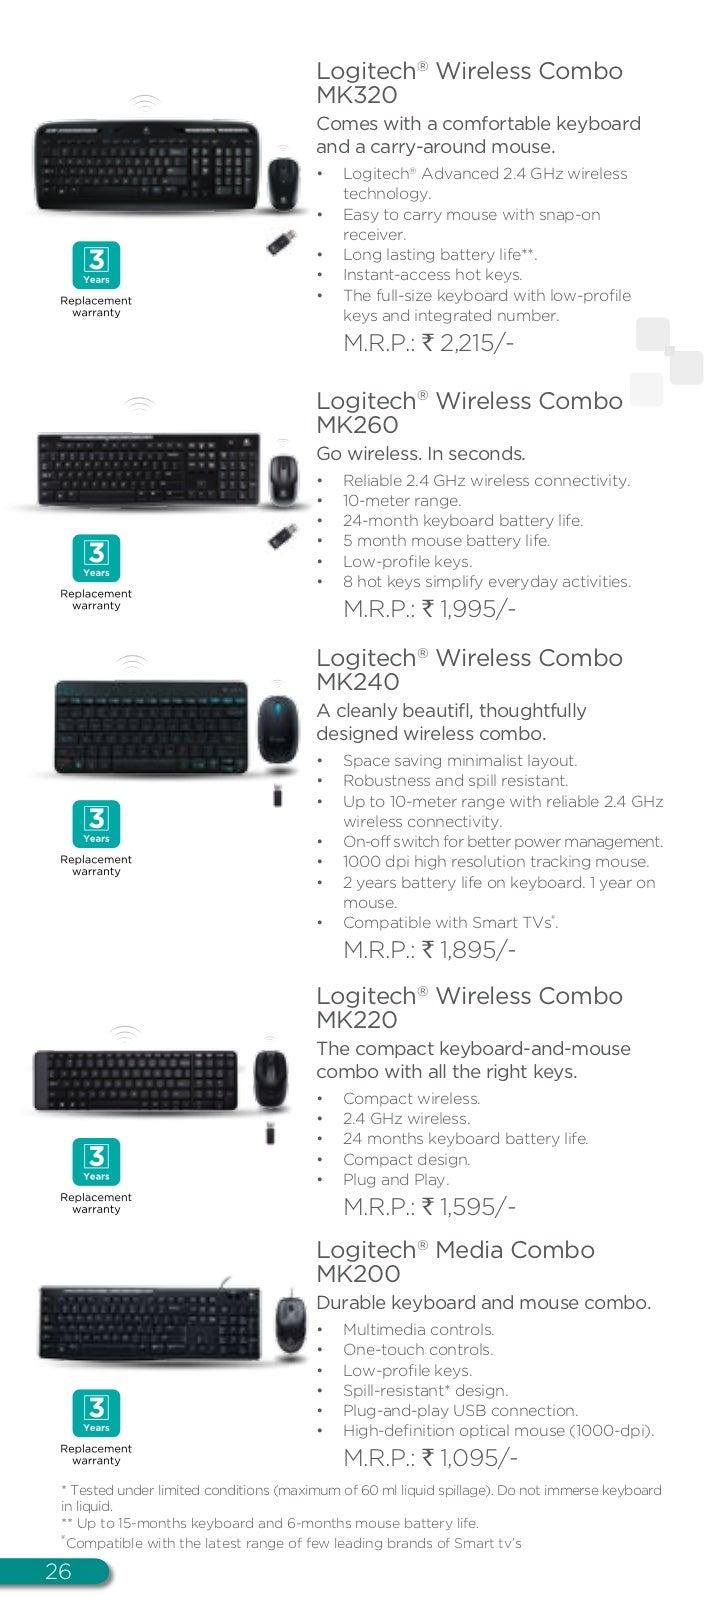 Logitech Digital It Catalogue Wireless Combo Mk240